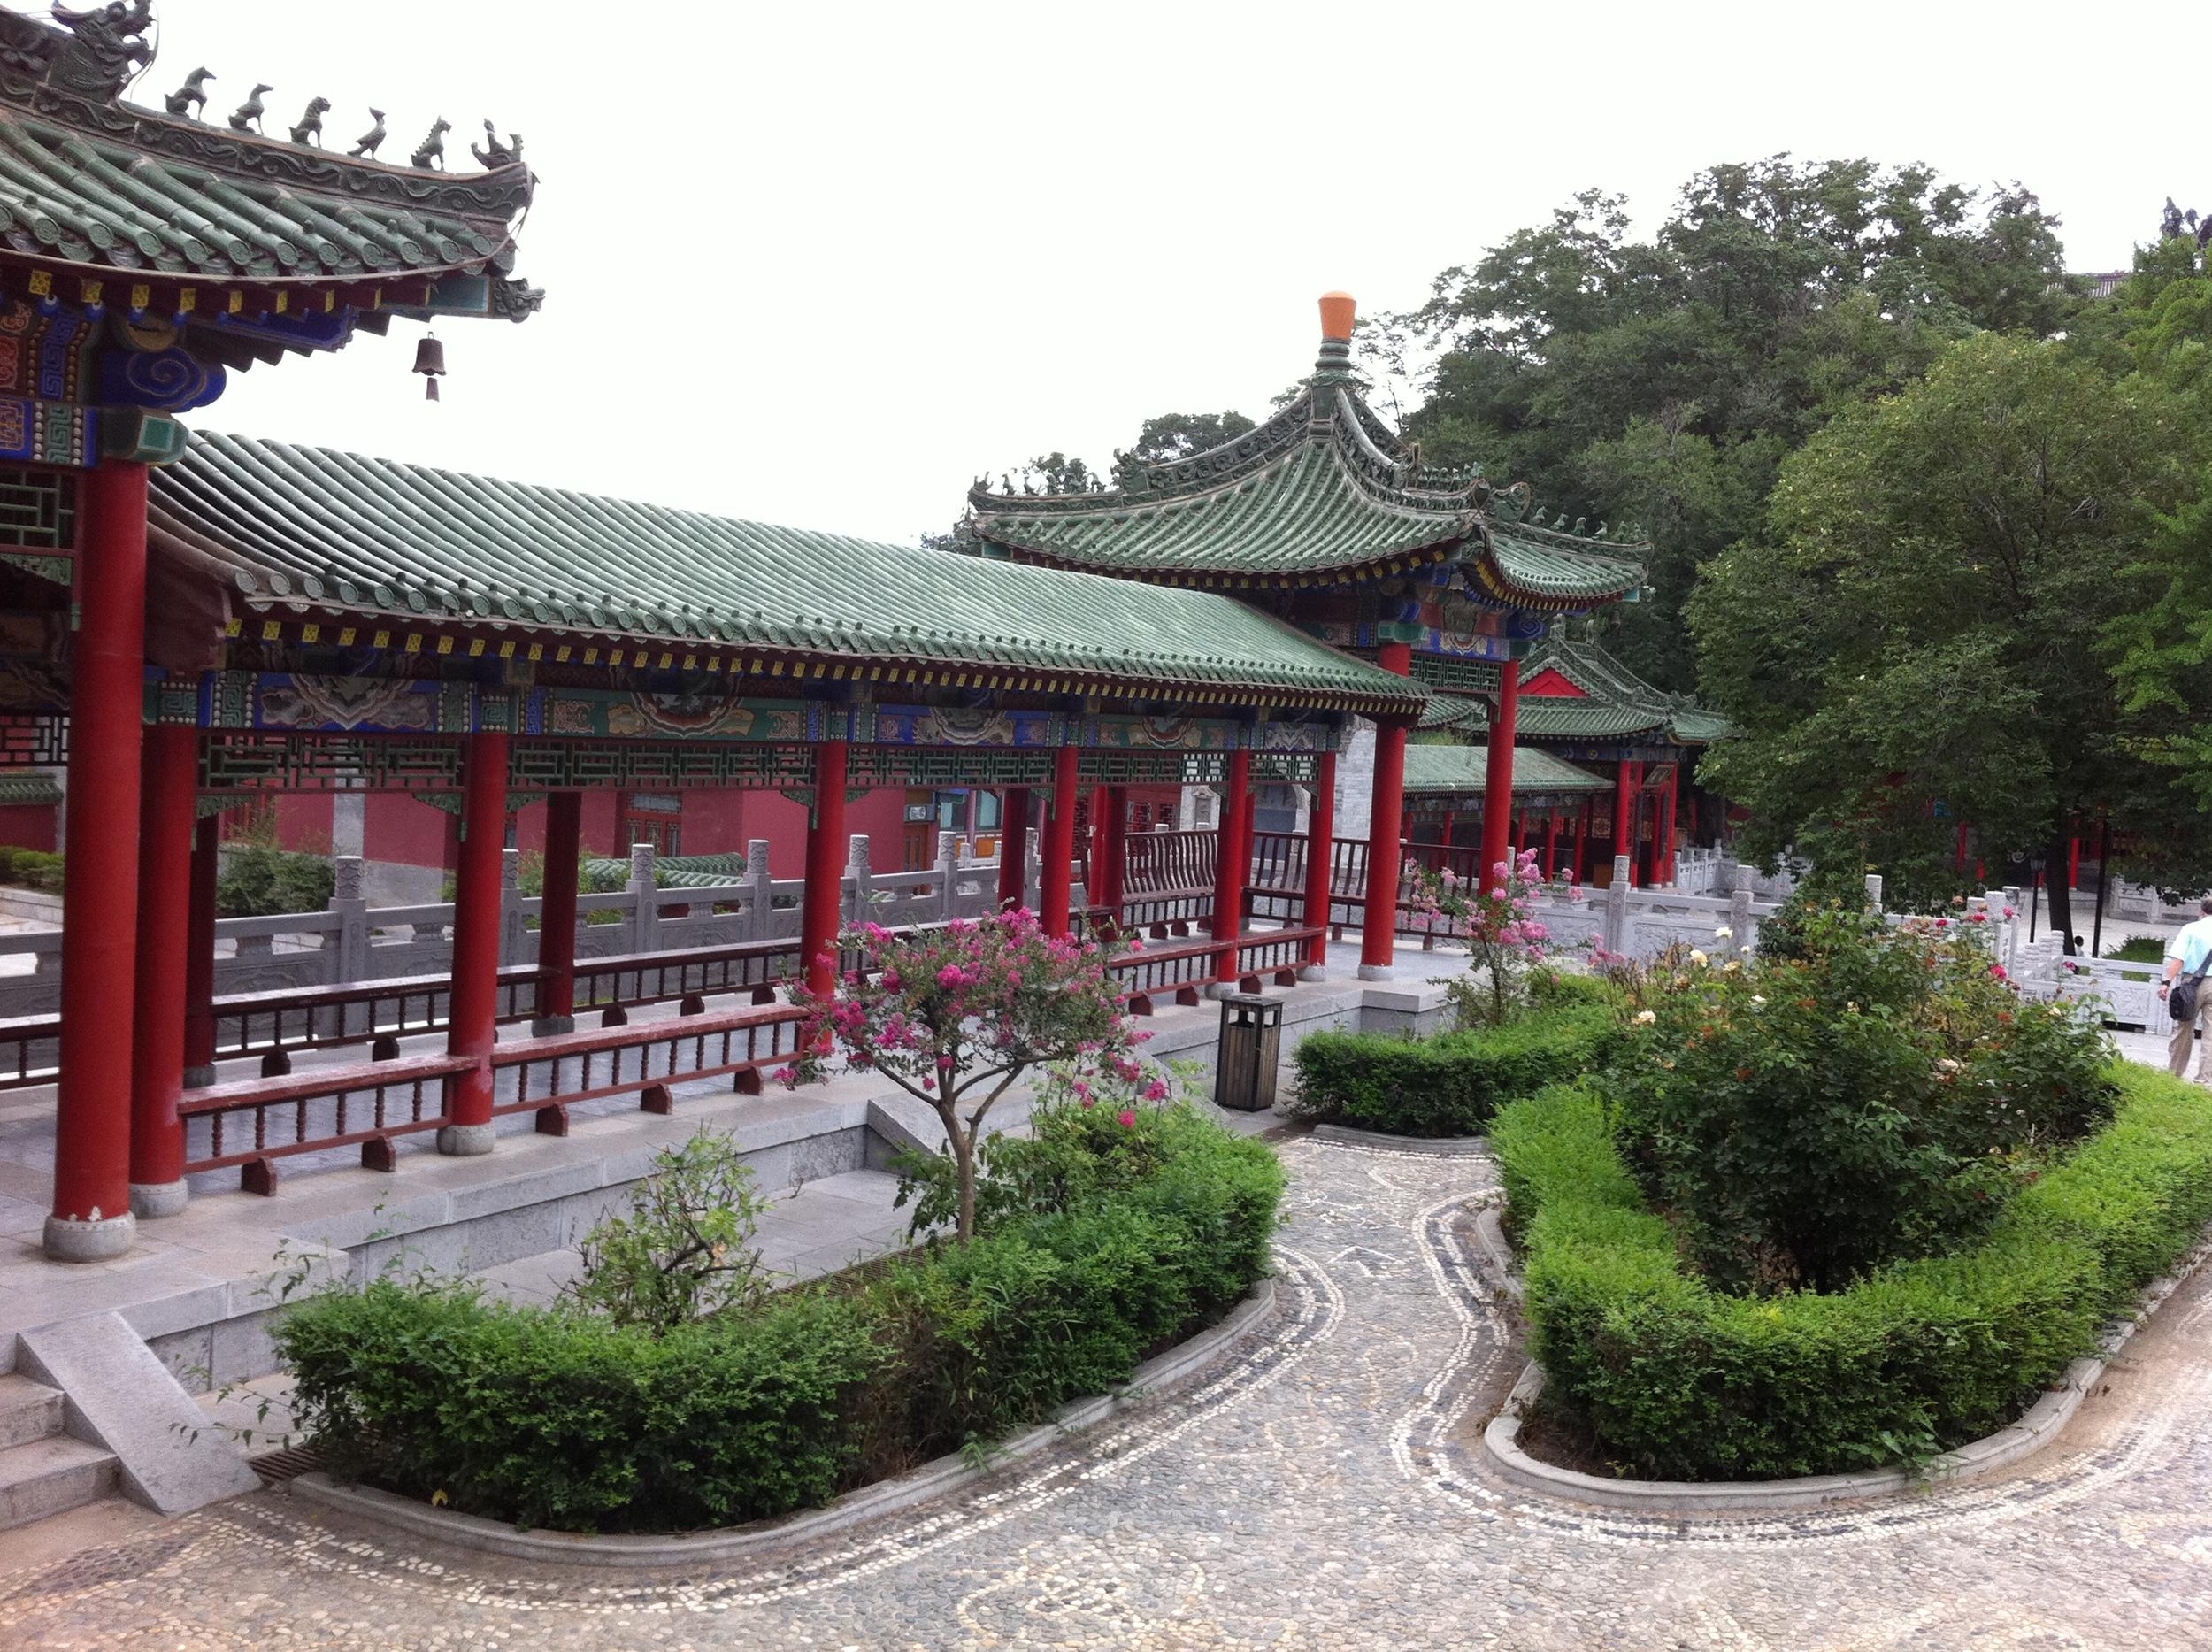 Lou Guan Taoist Temple